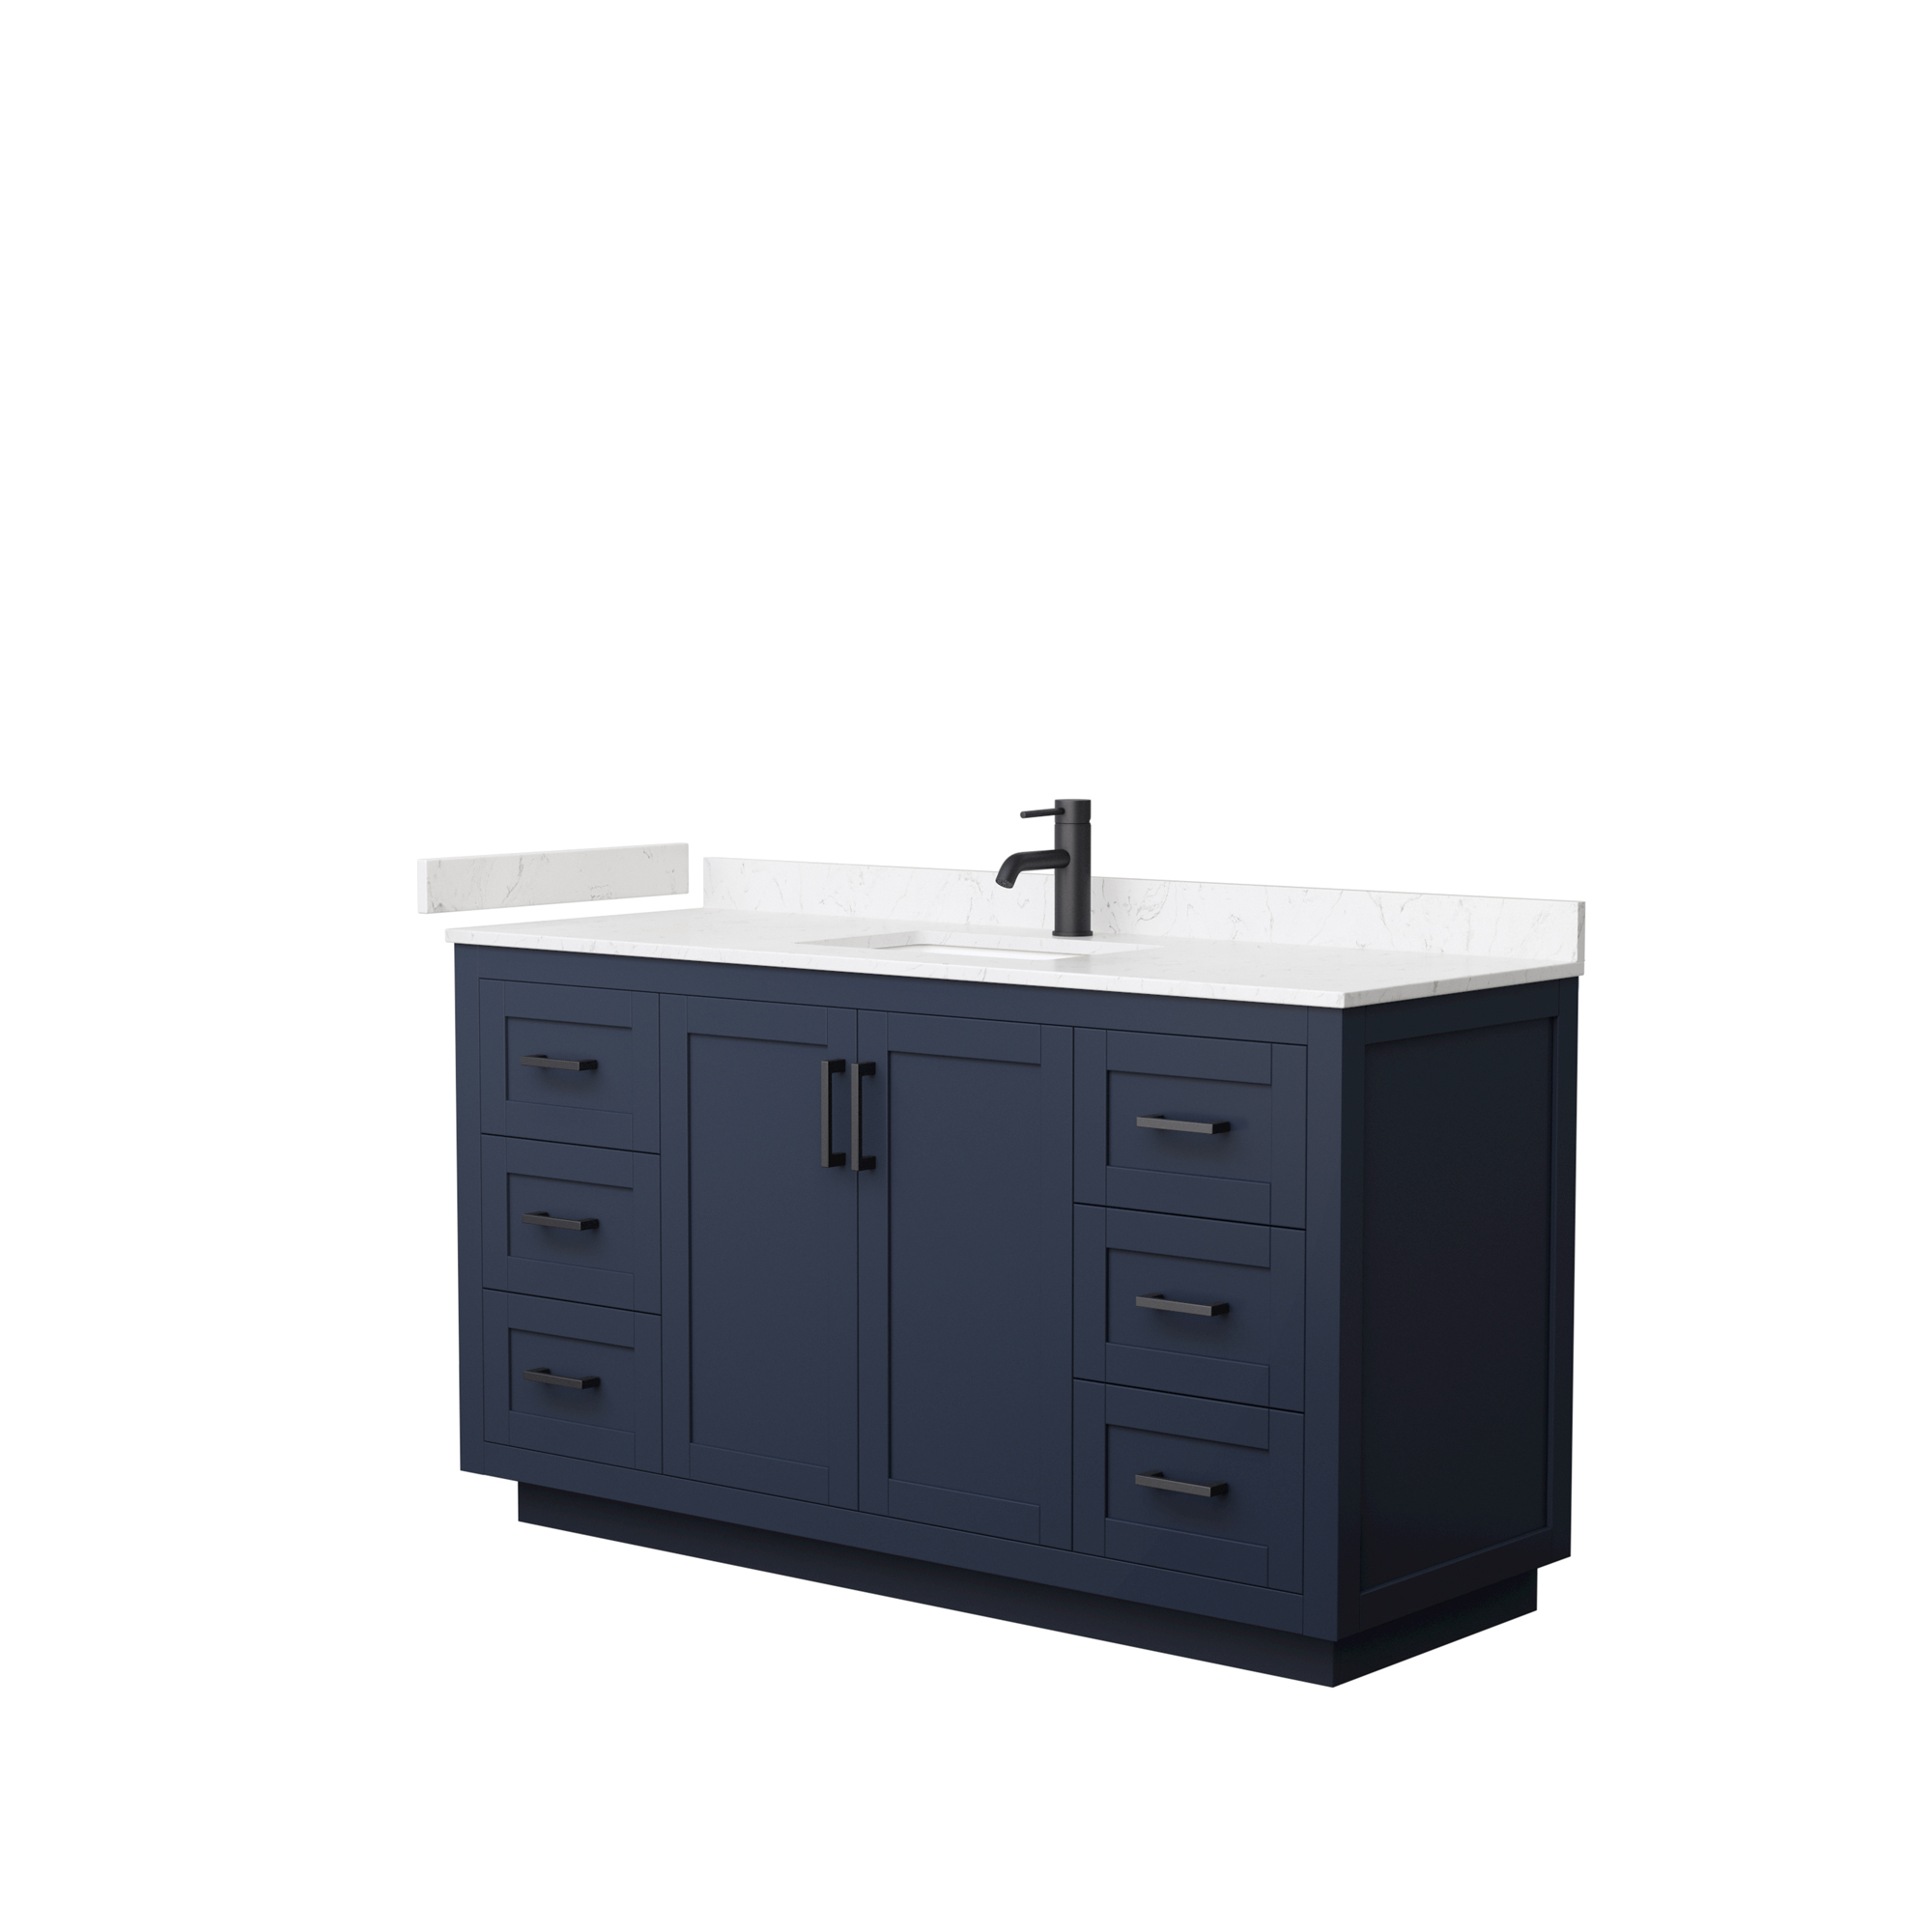 "60"" Single Bathroom Vanity in Dark Blue, Light-Vein Carrara Cultured Marble Countertop, Undermount Square Sink, Matte Black Trim"